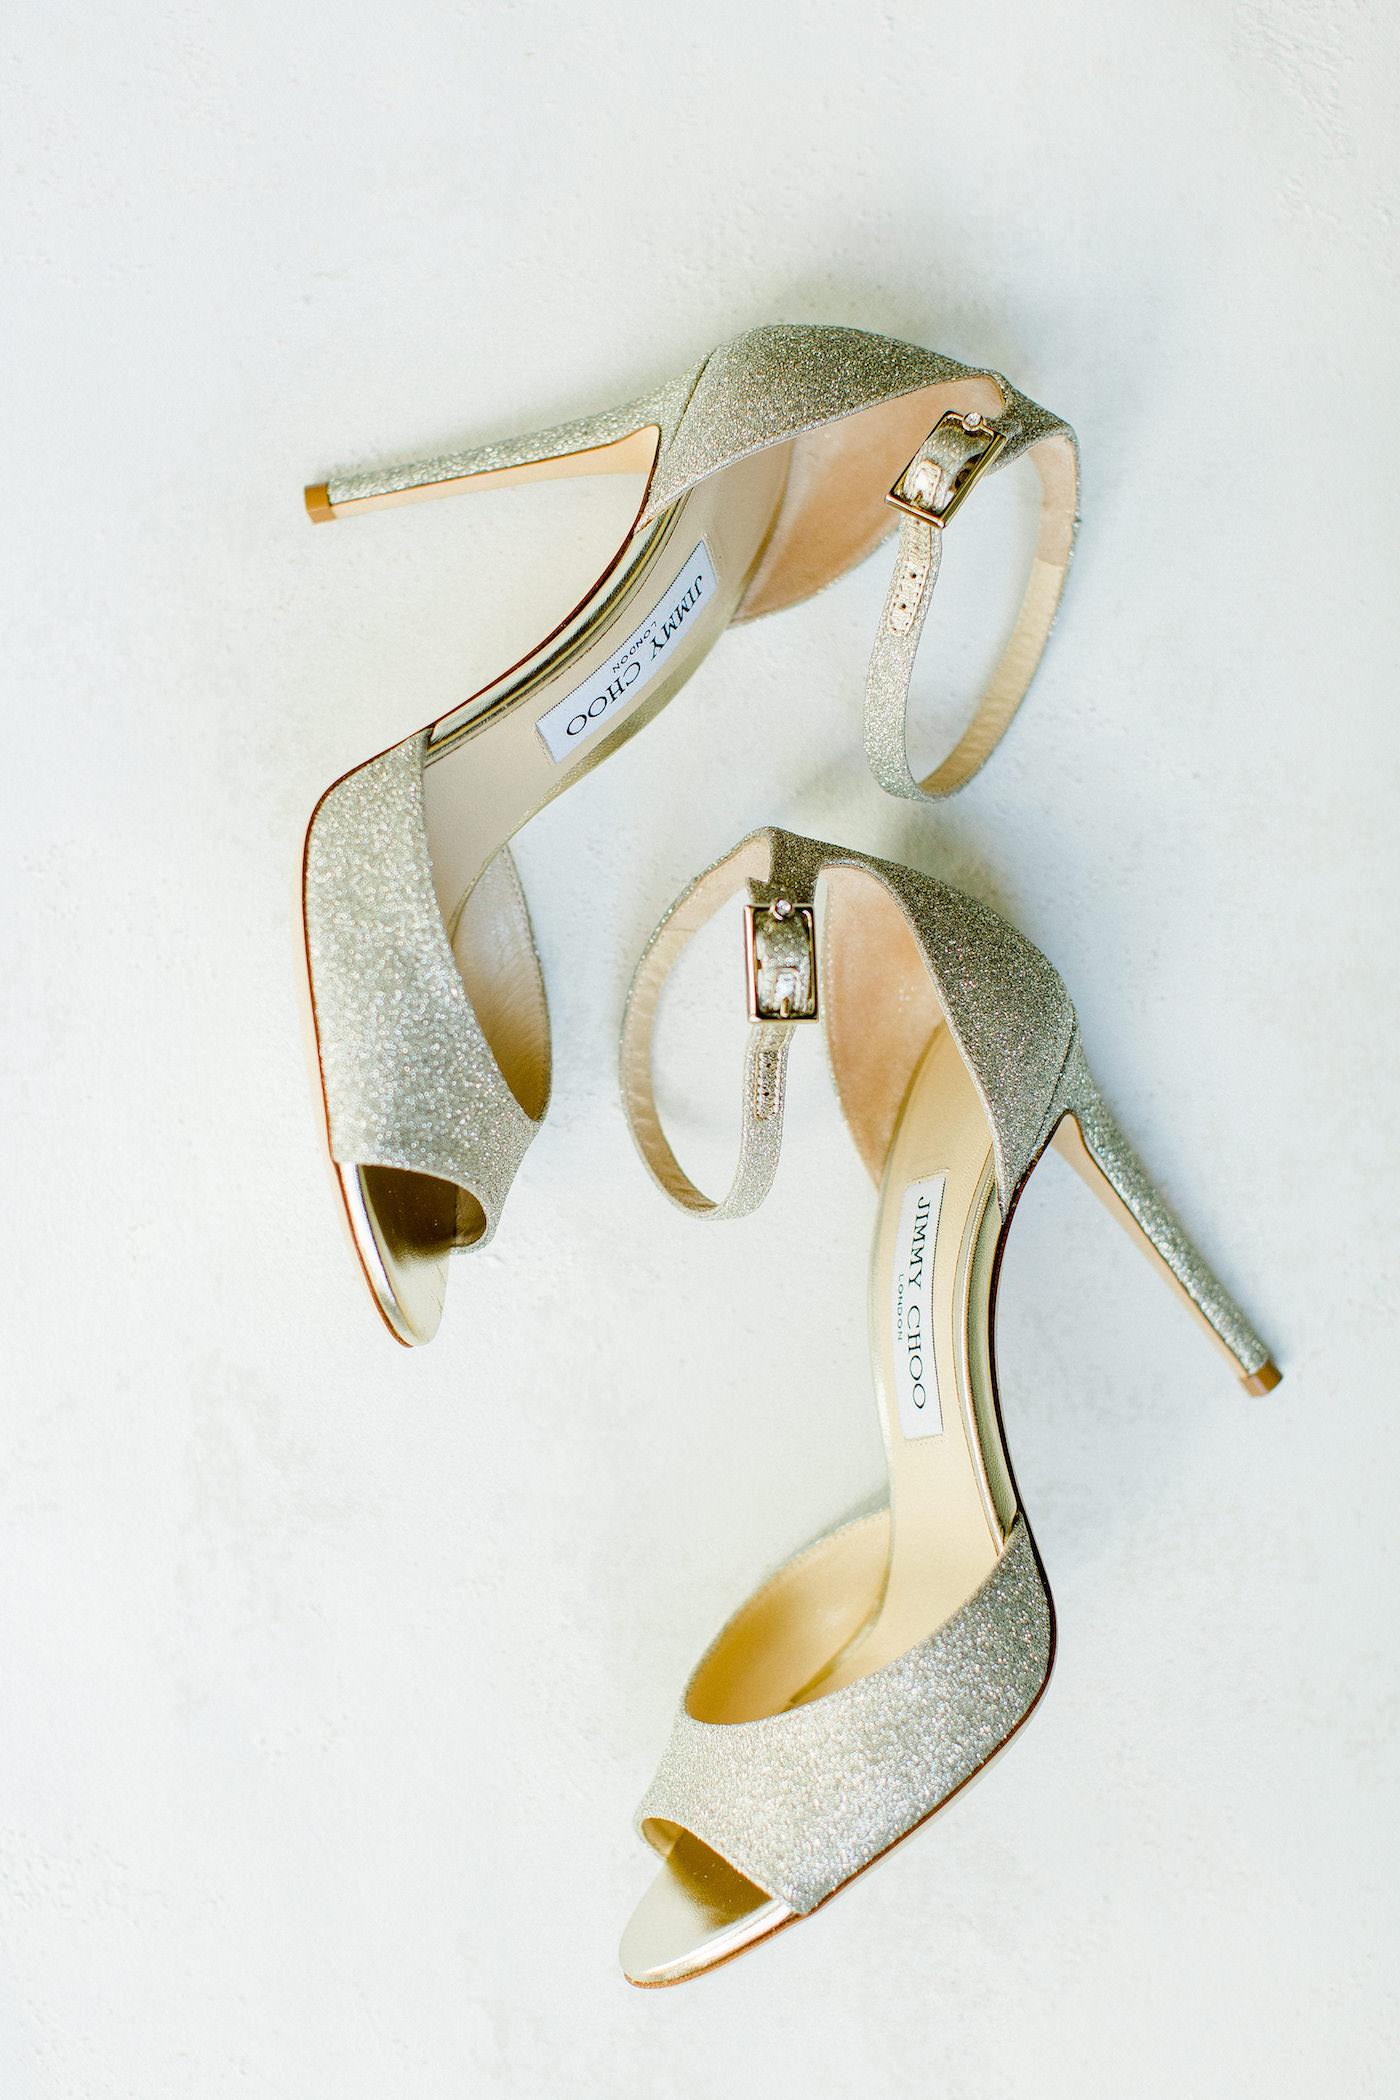 Gold Shimmer Sparkle Glitter Jimmy Choo Bridal Shoes | Florida Wedding Planner Breezin' Weddings